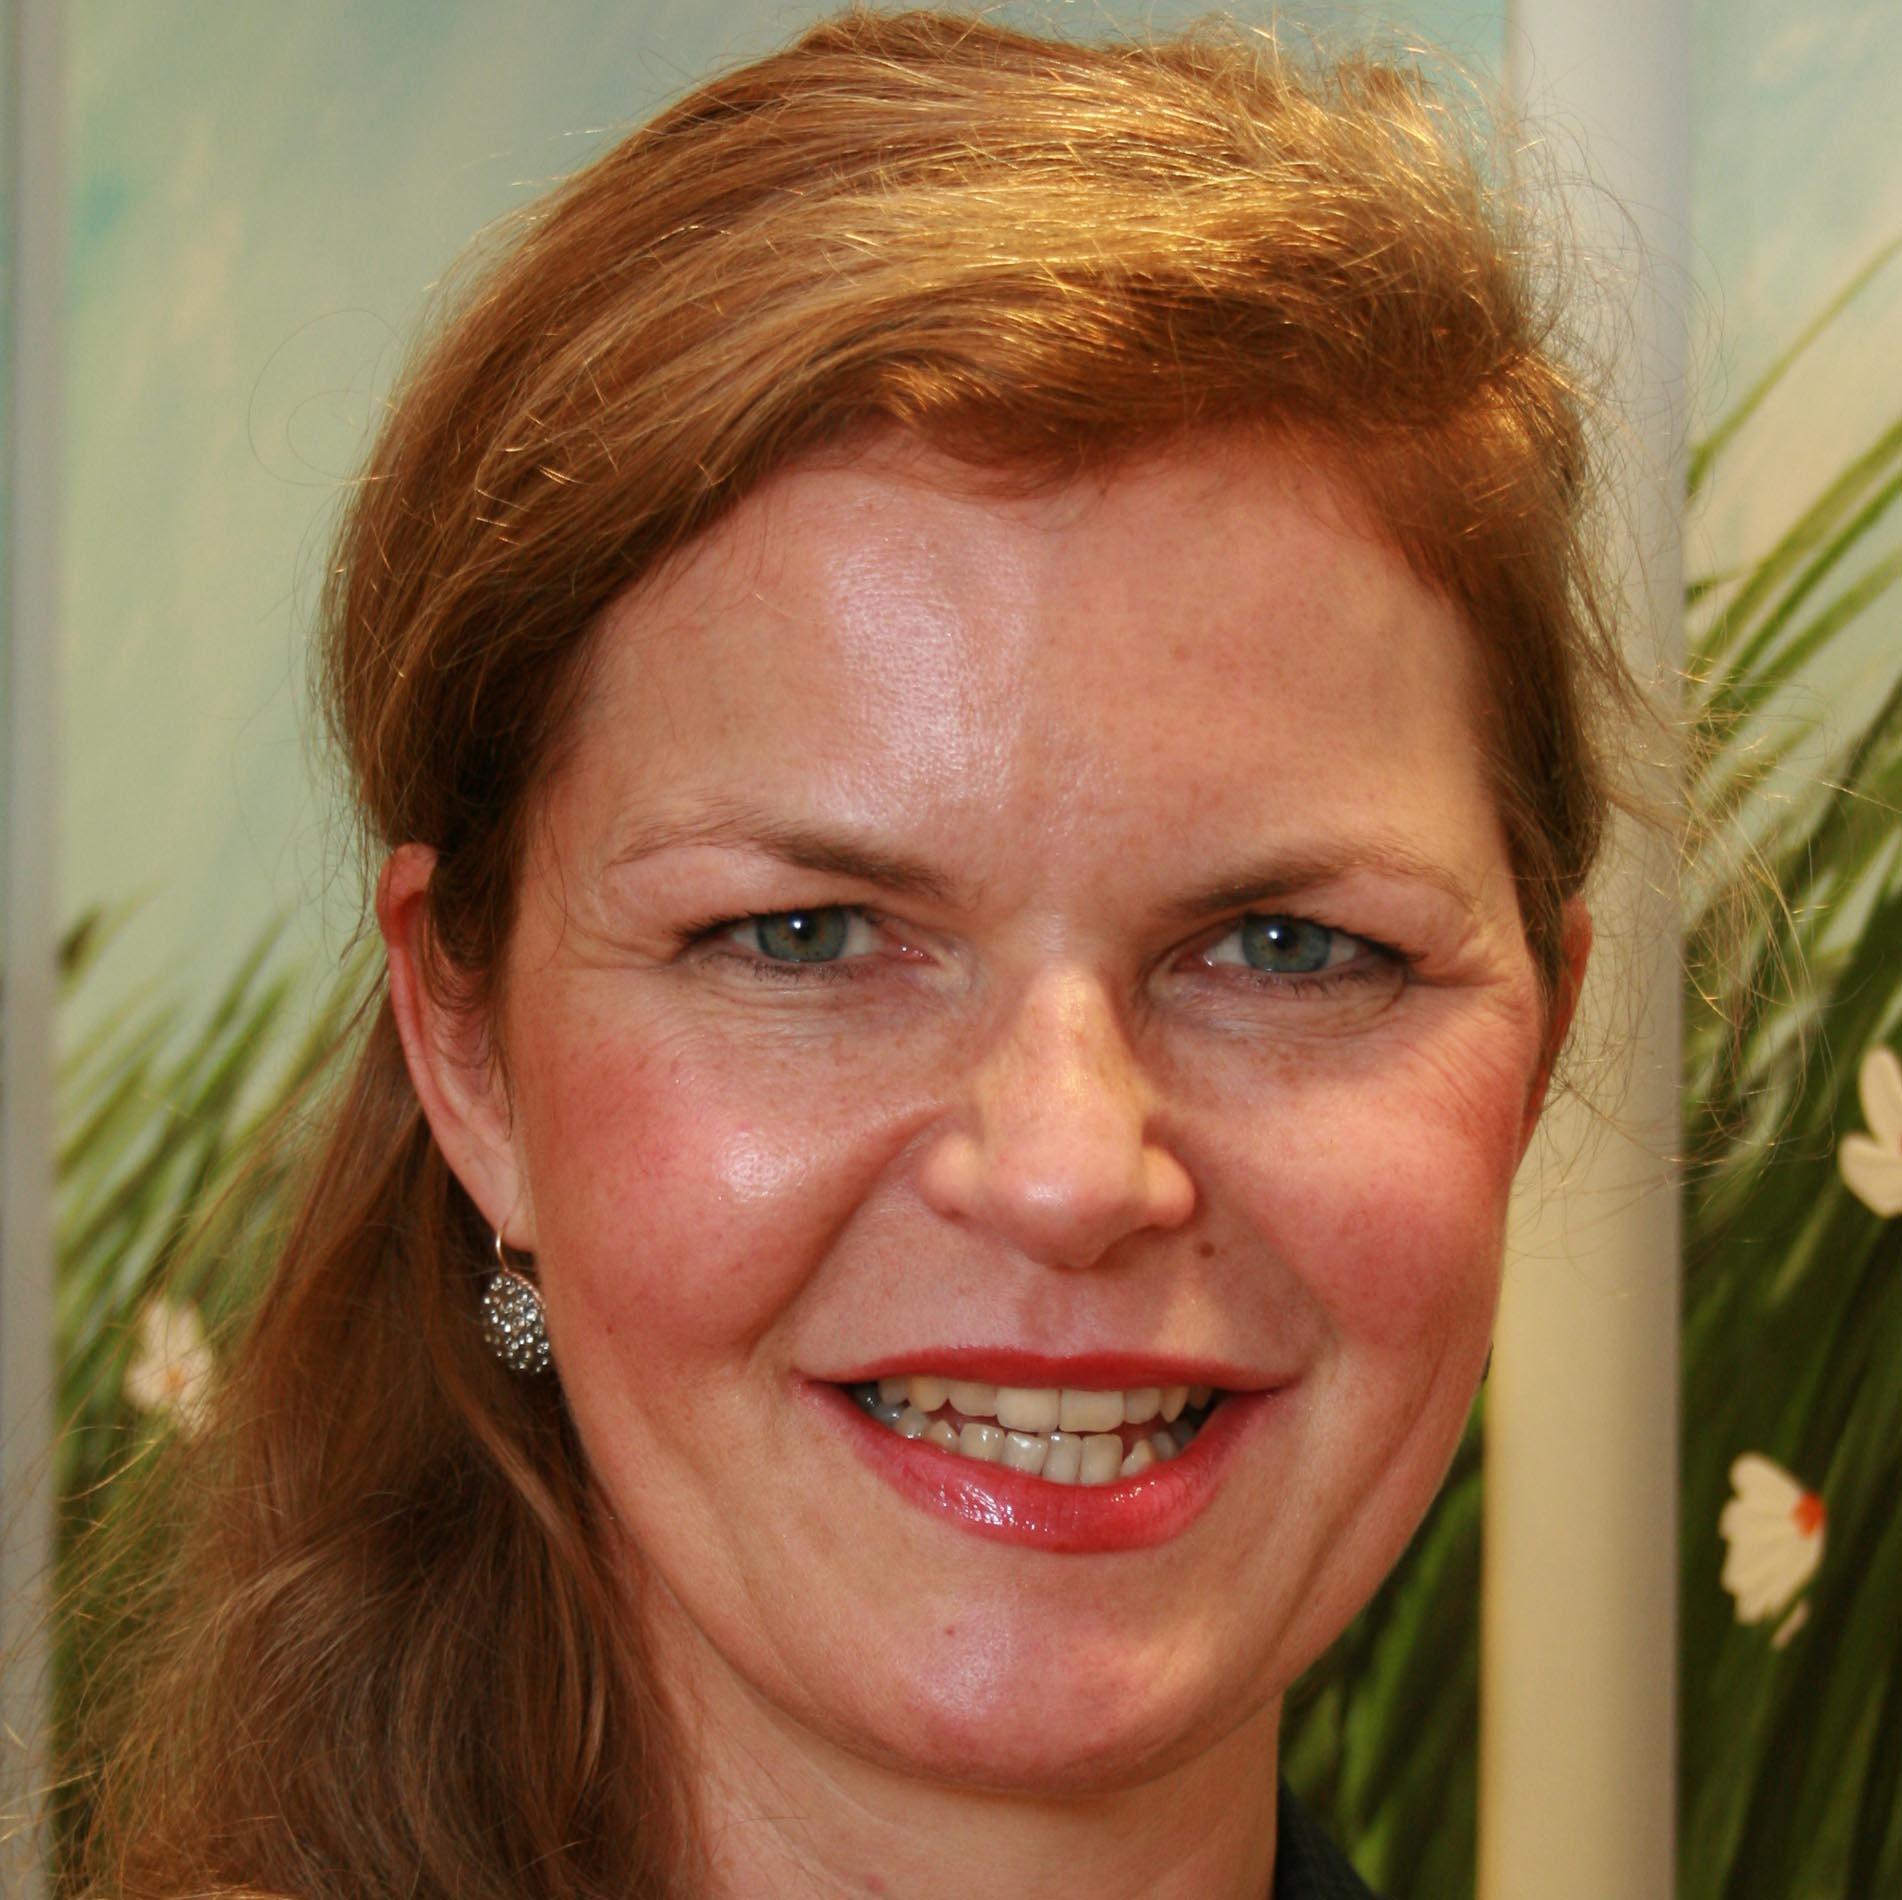 Katja Pivit